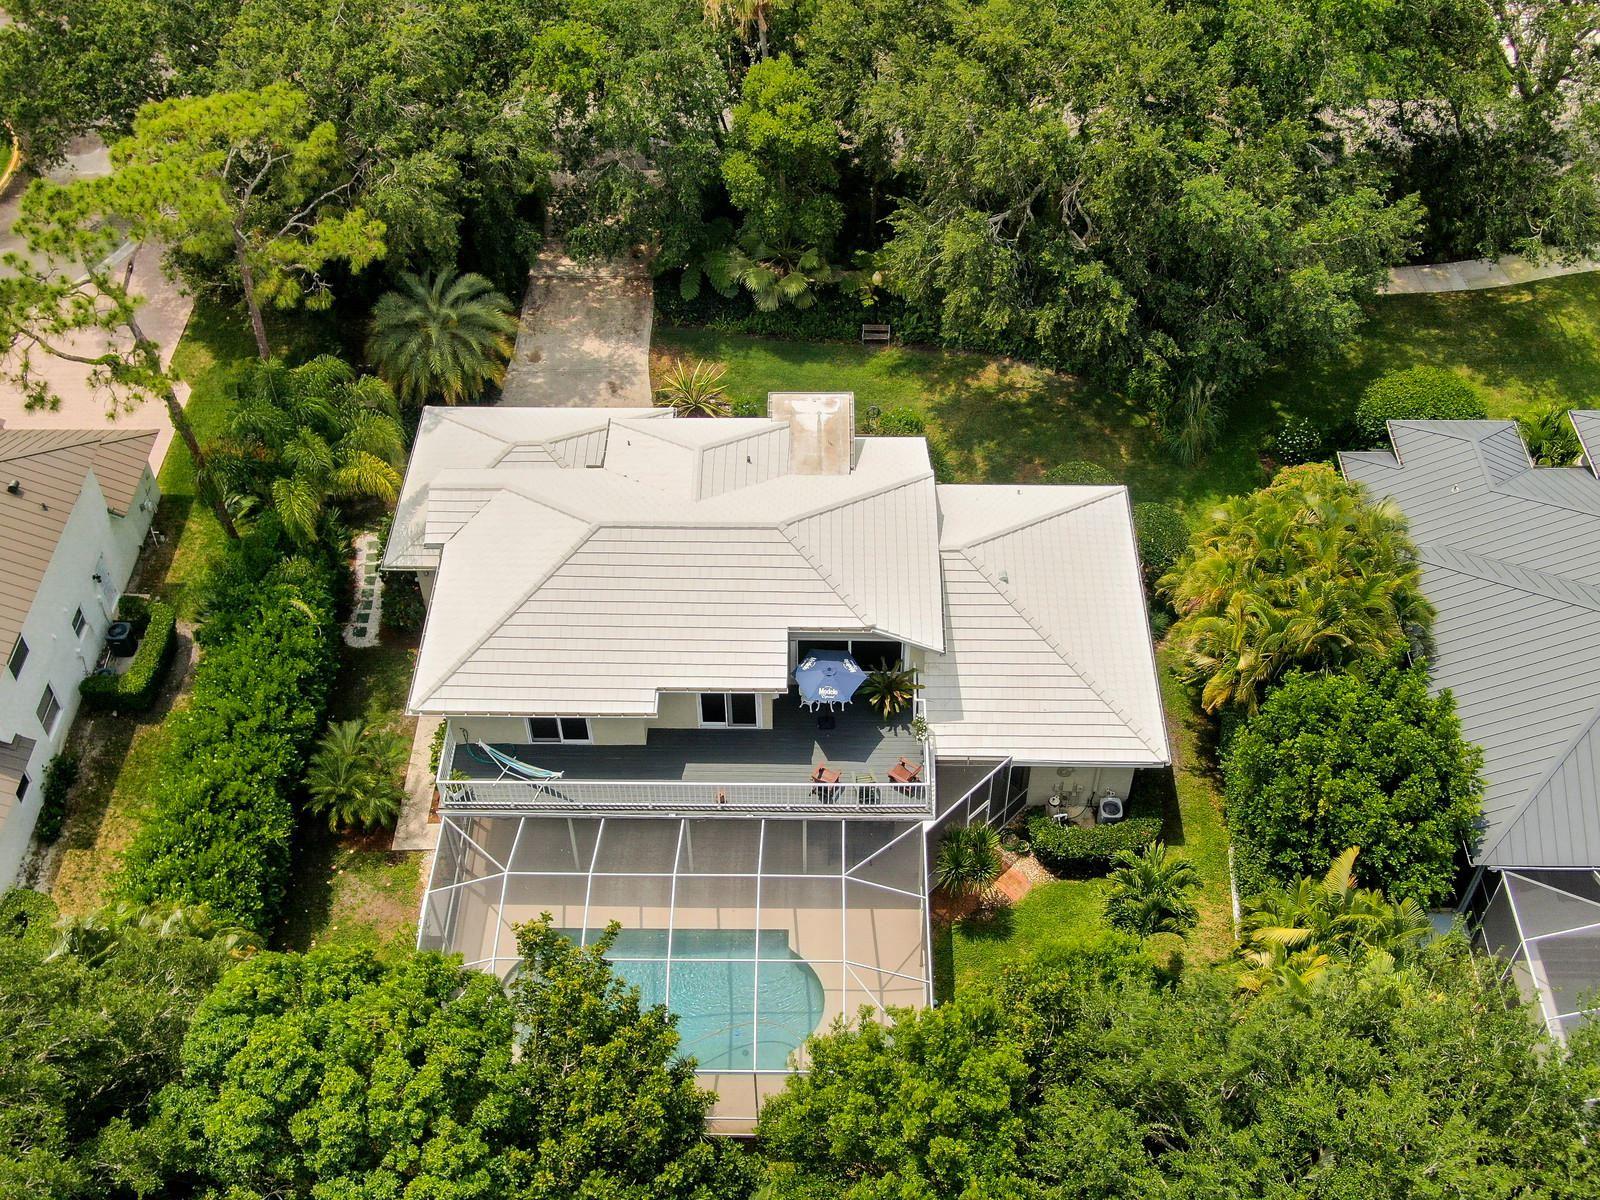 19115 SE Coral Reef Lane, Jupiter, FL 33458 - #: RX-10617765